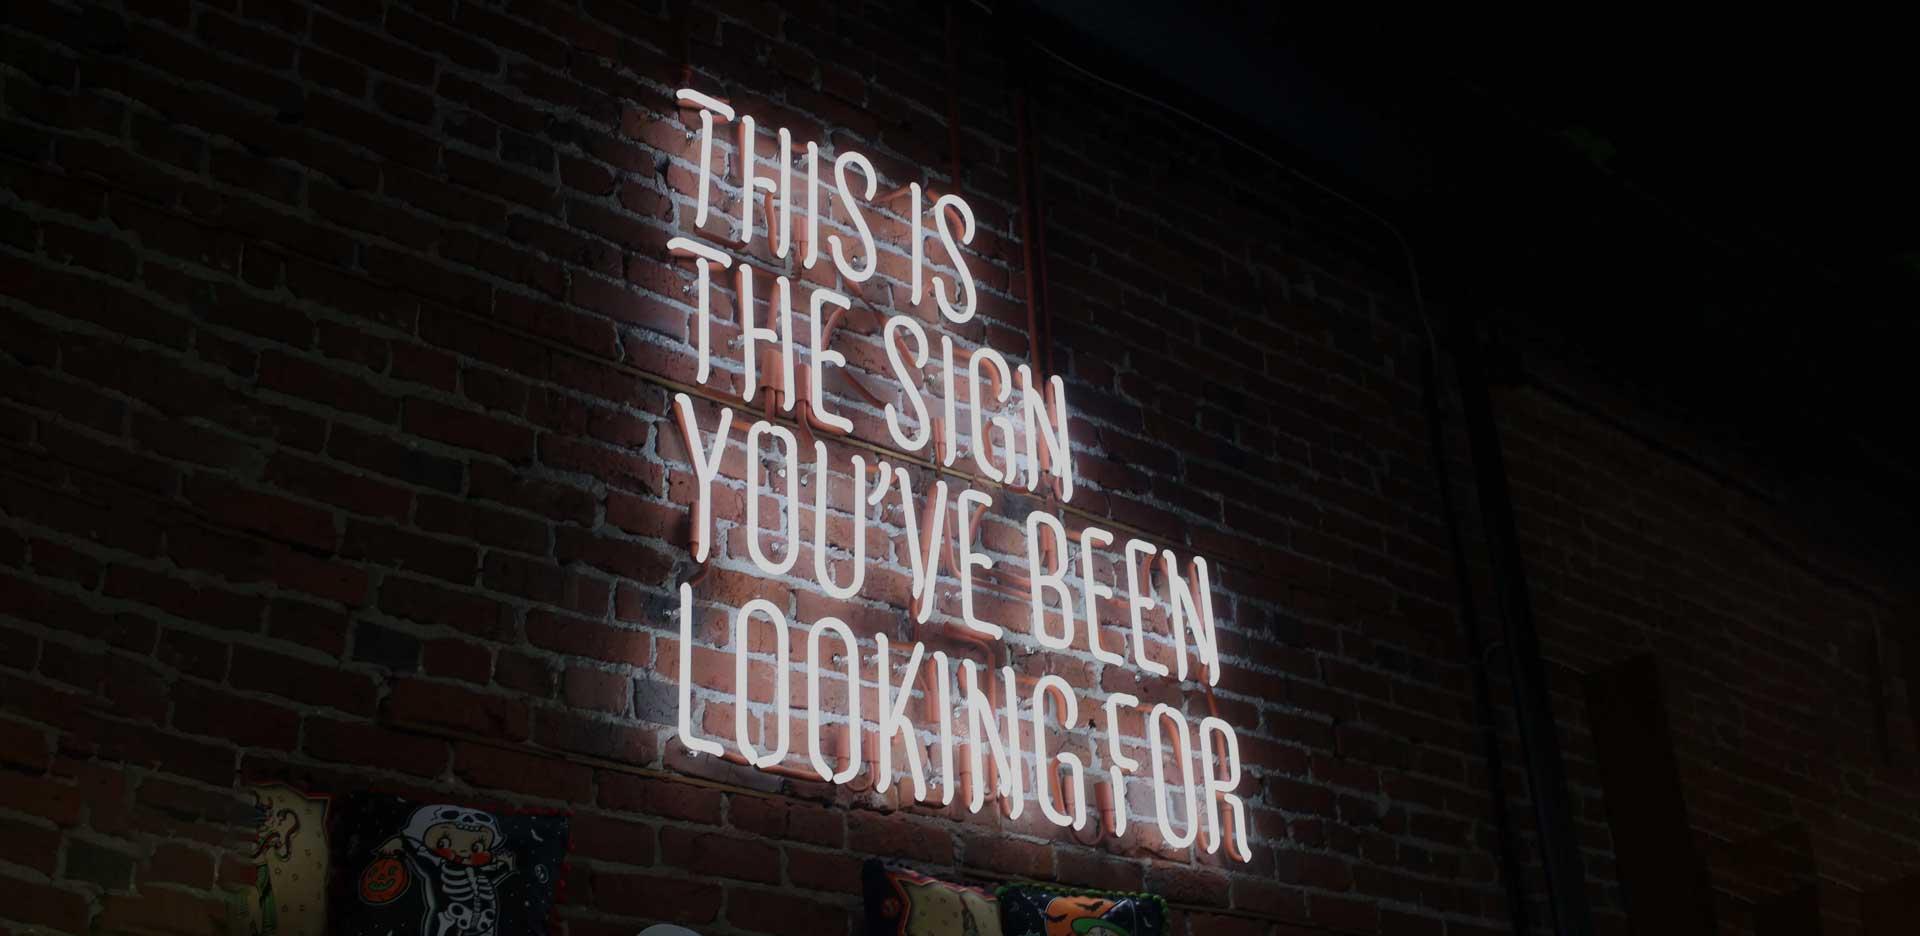 Three ways to pivot and make your personal brand shine through a crisis